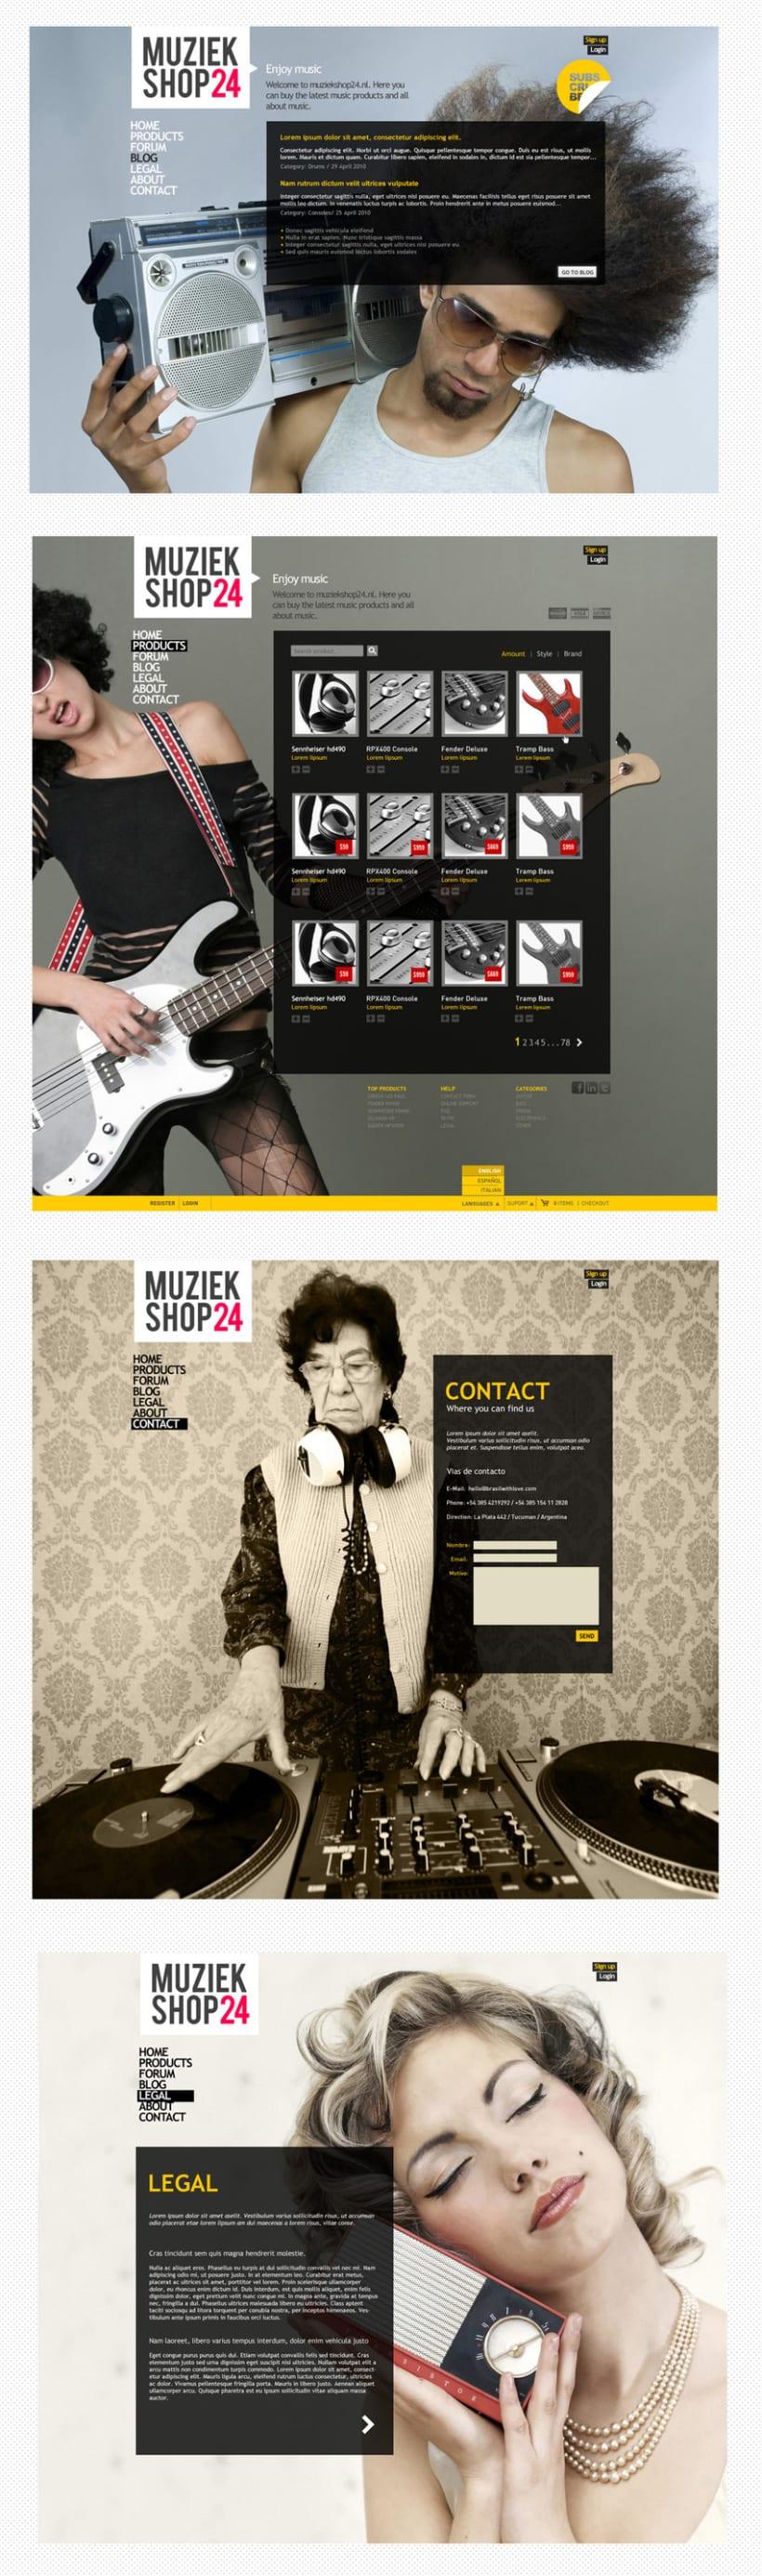 Muziek Shop v2 2